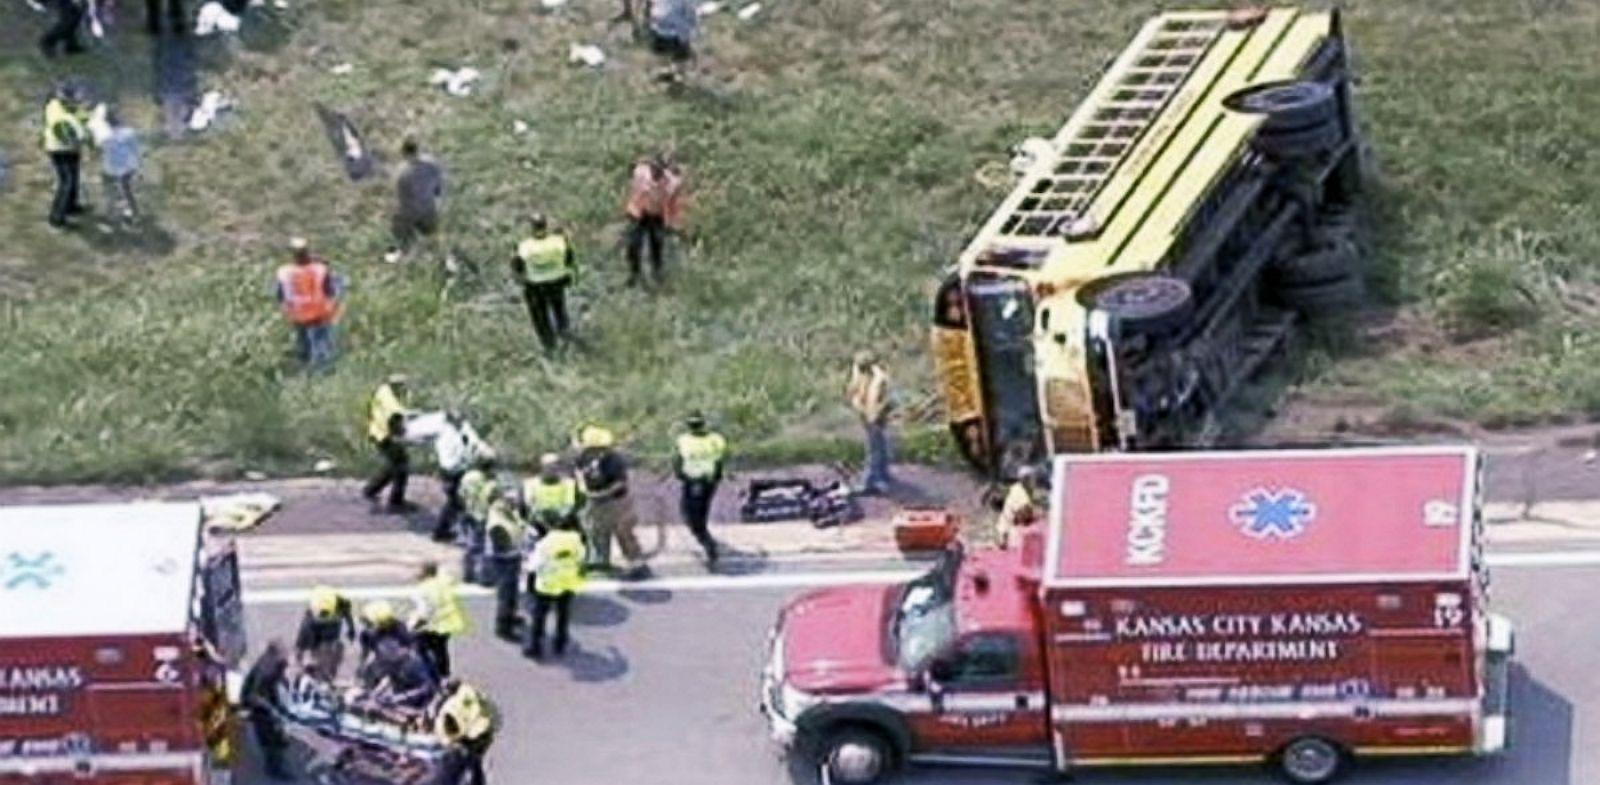 PHOTO: Overturned school bus